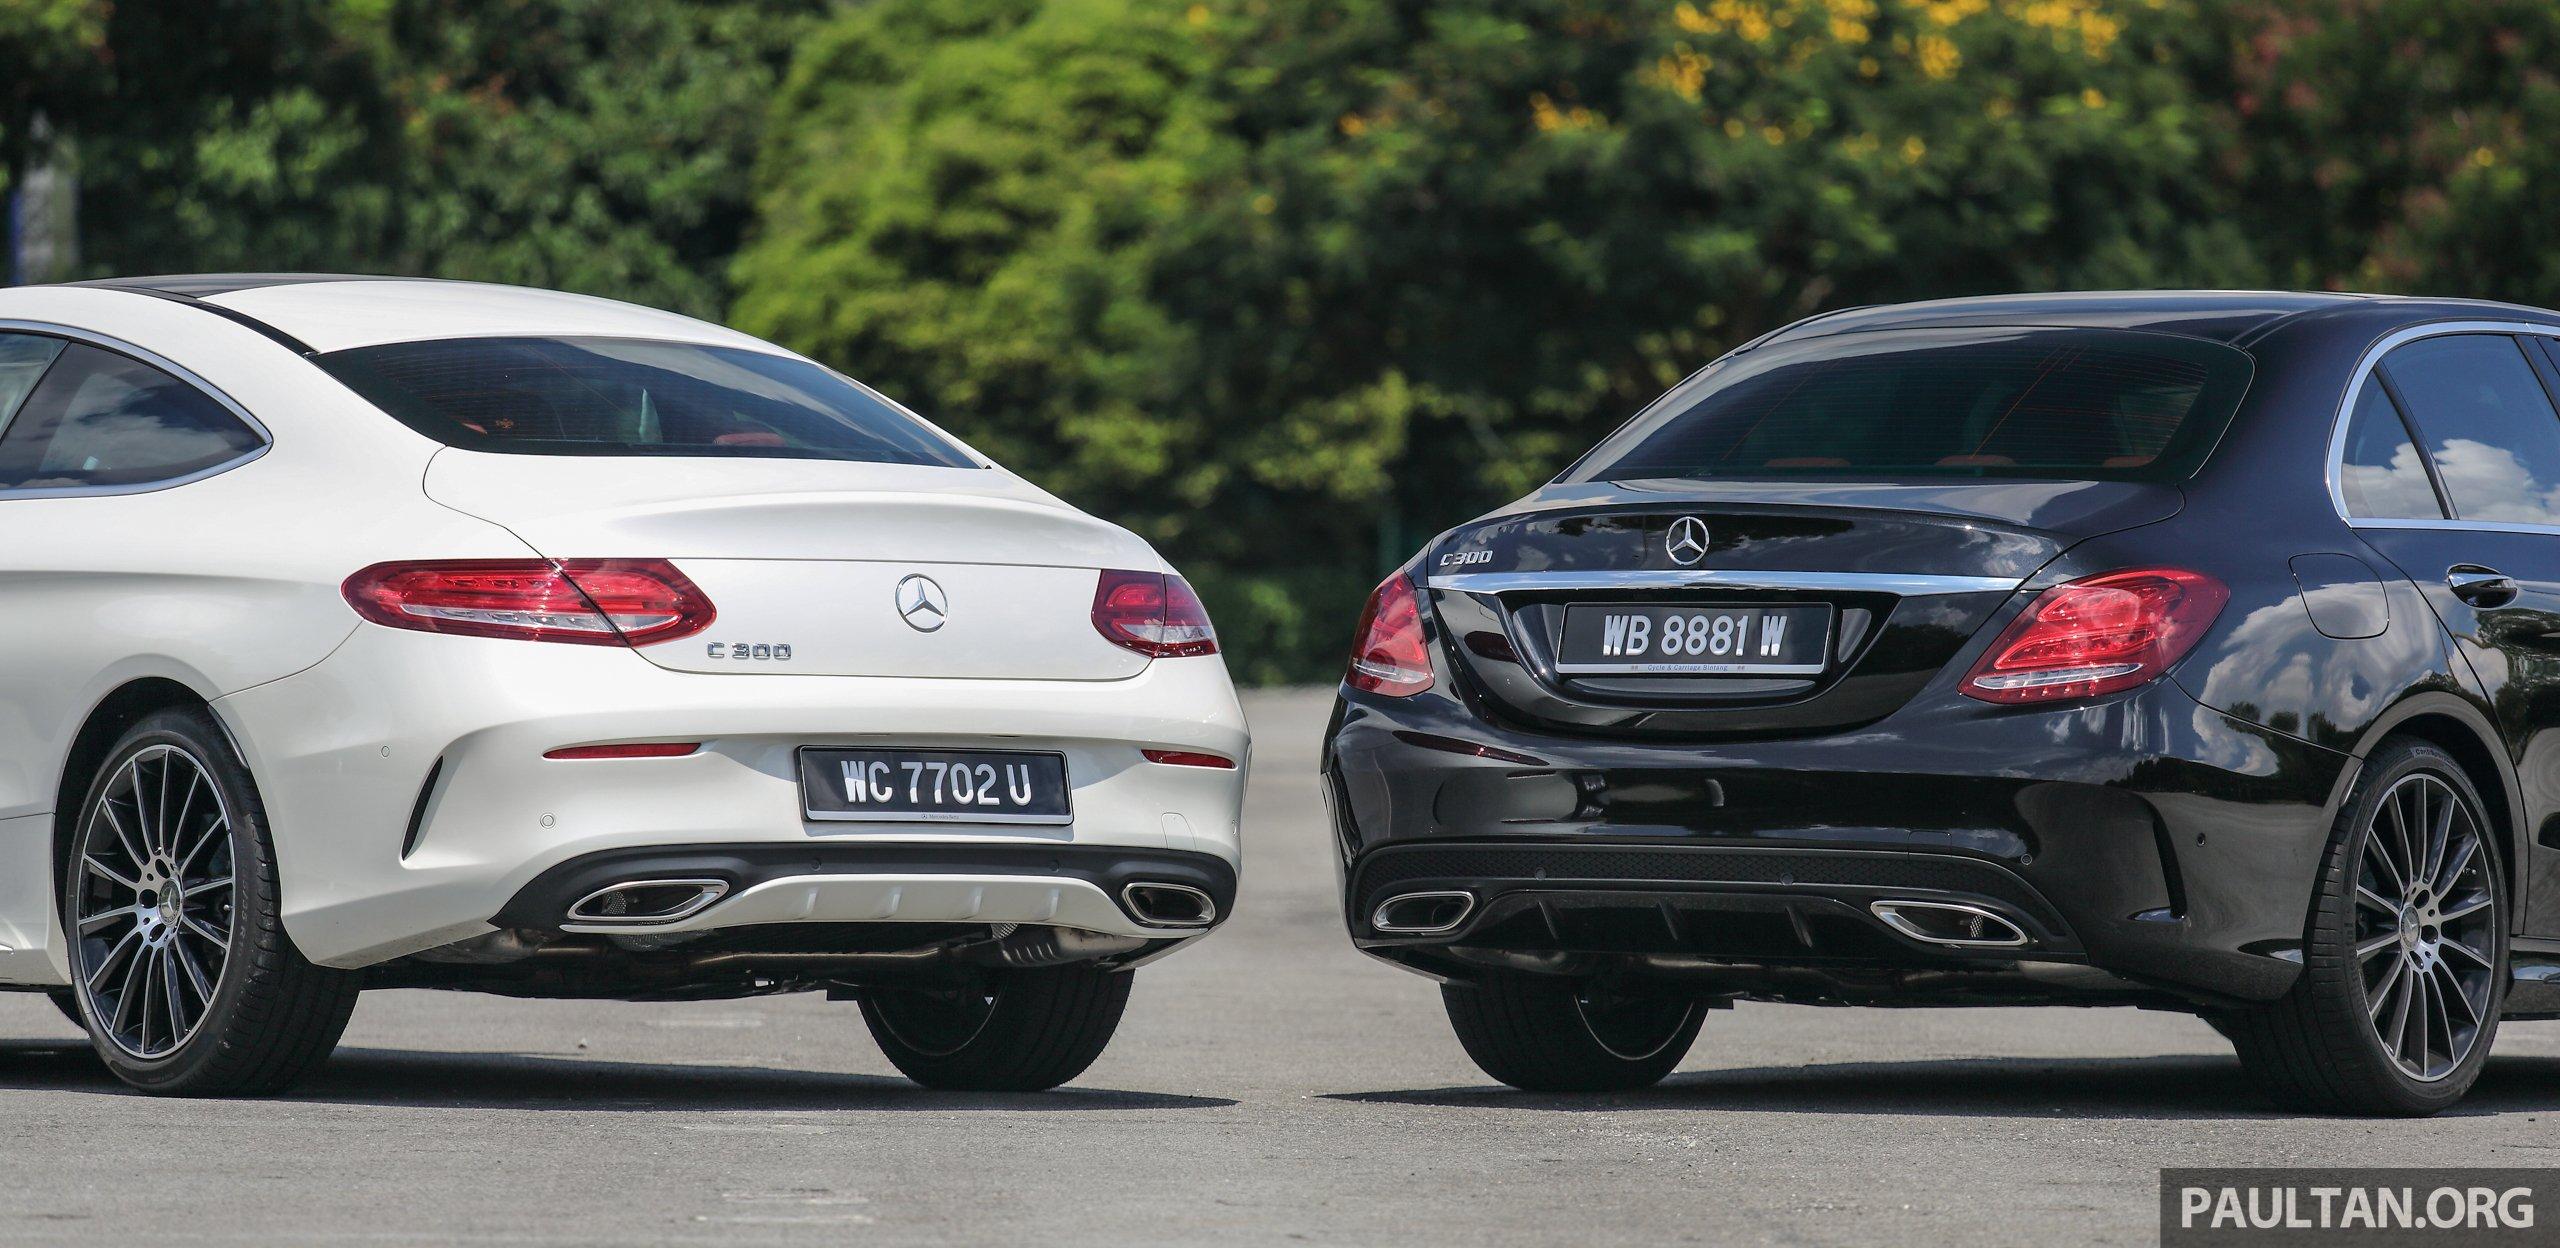 Gallery Mercedes Benz C300 Coupe Vs Sedan Paul Tan Image 495920